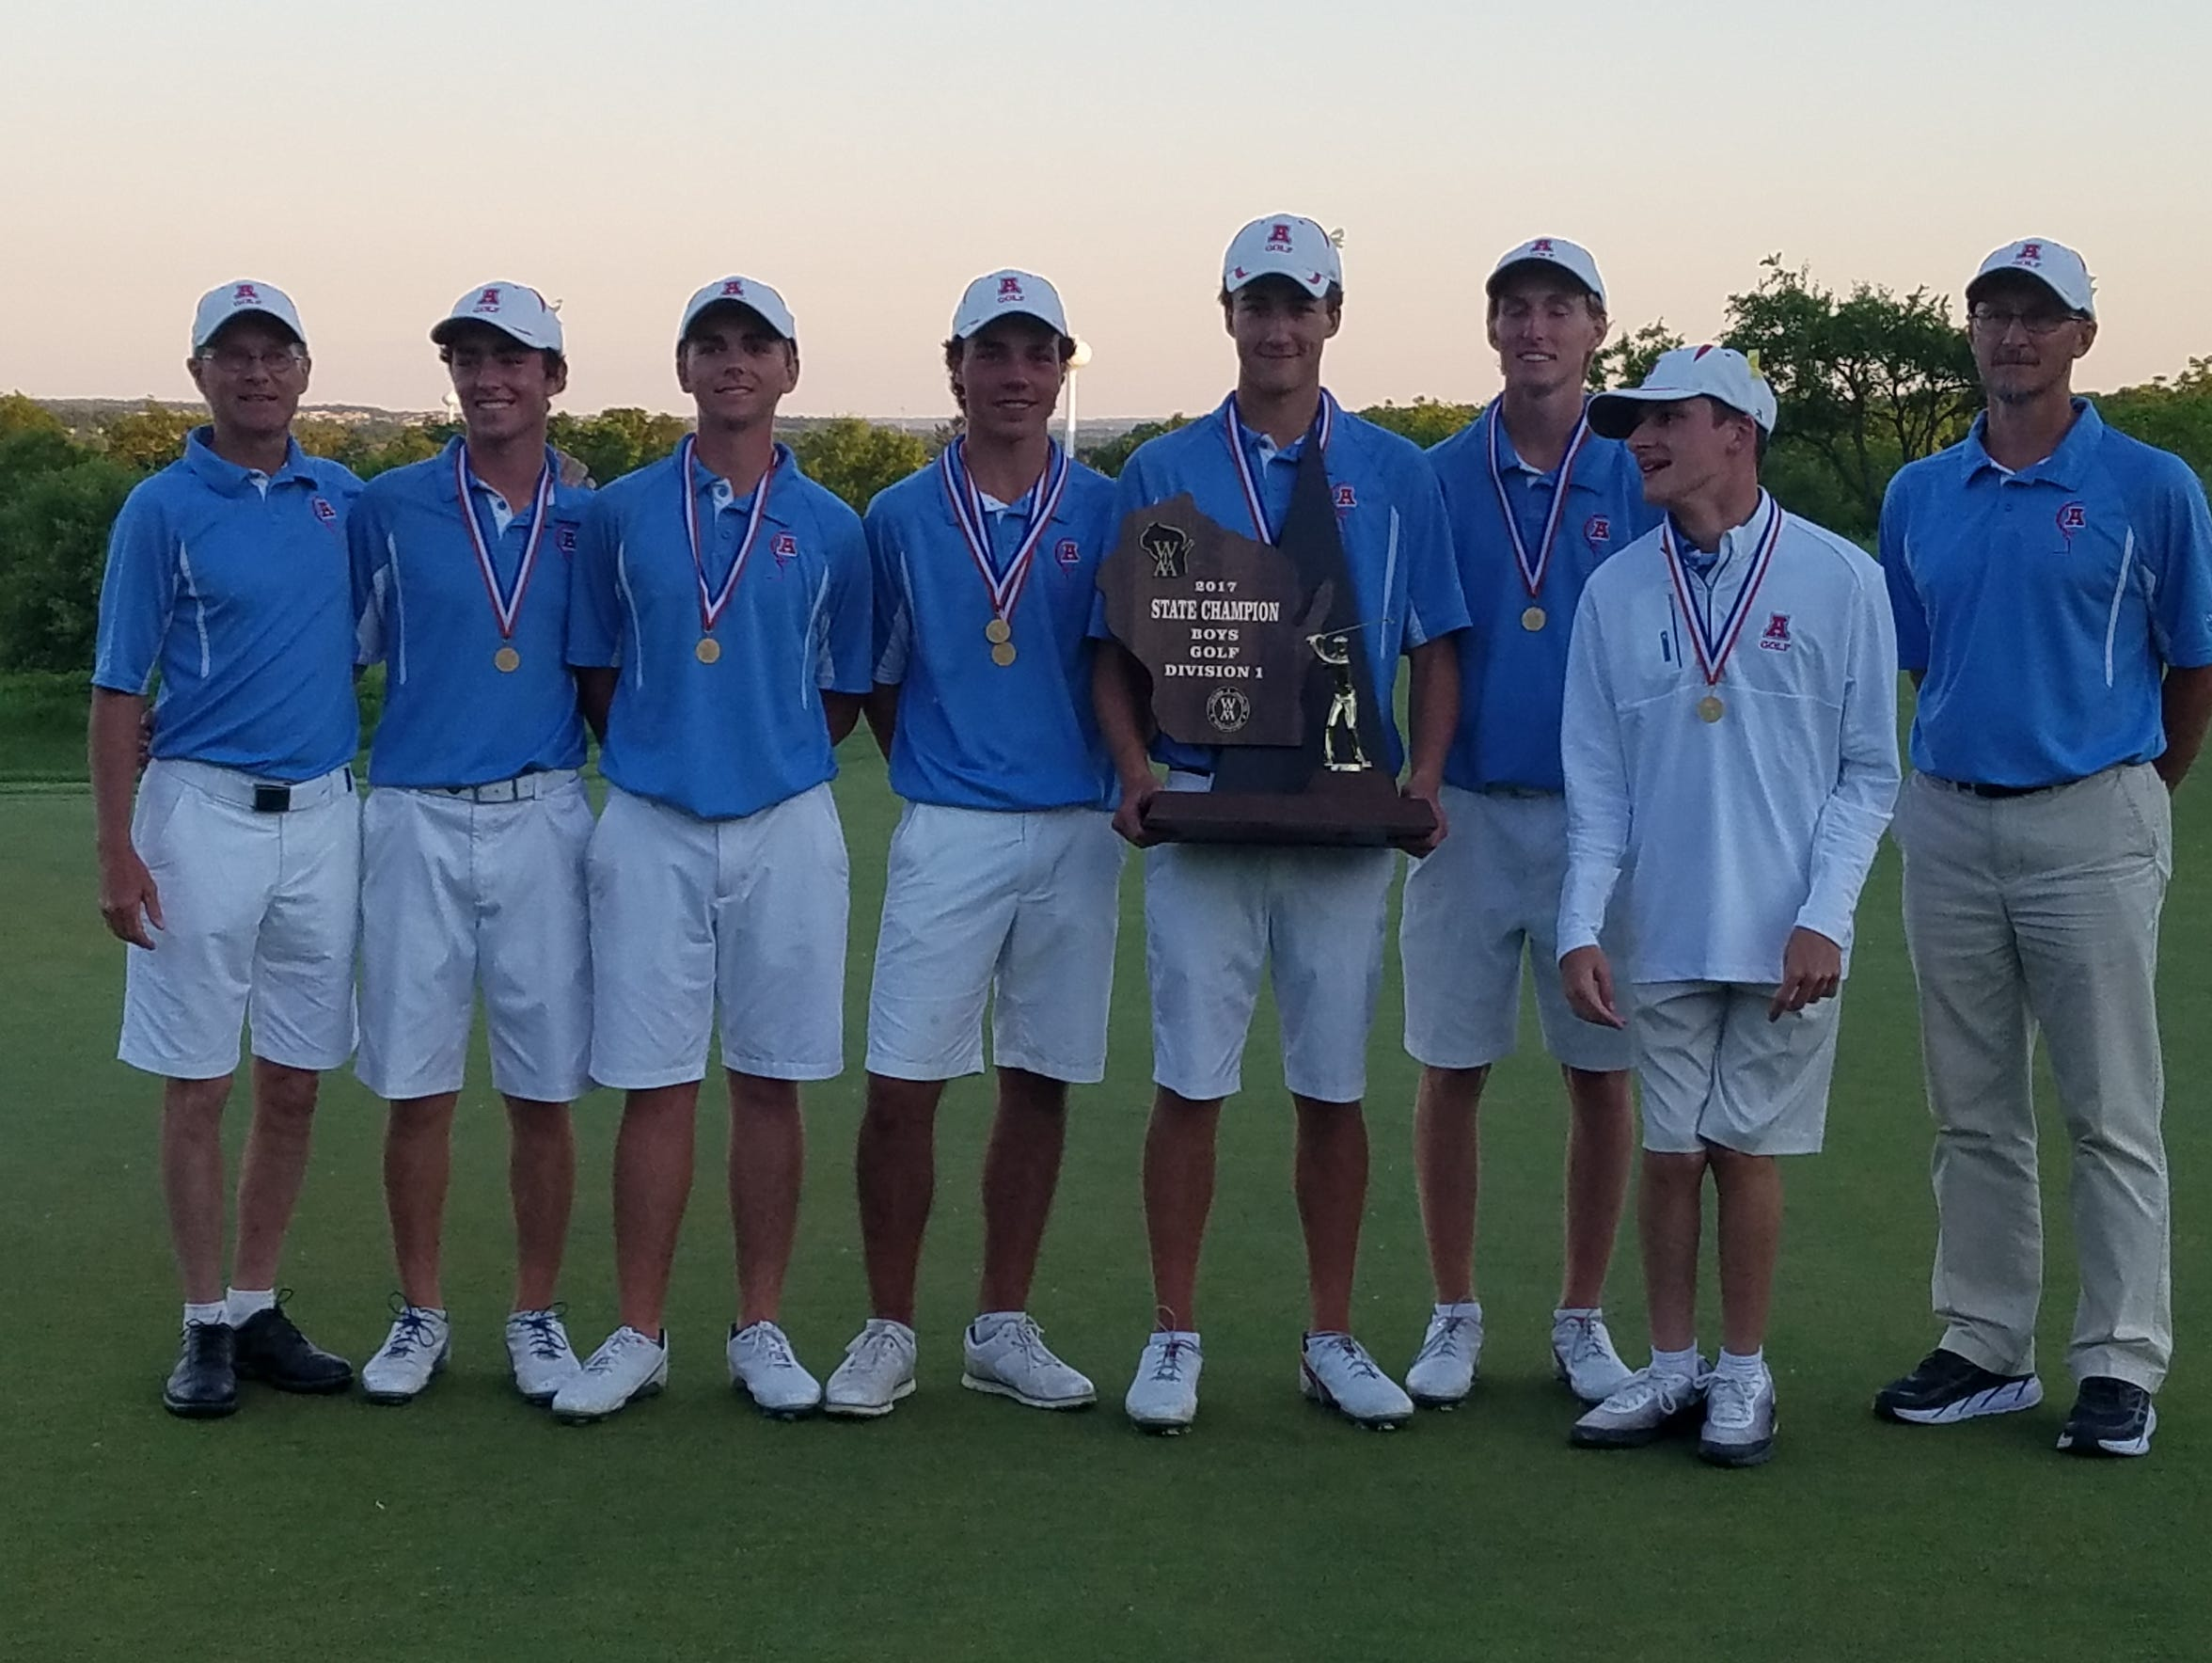 The Arrowhead boys golf team won the Division 1 state